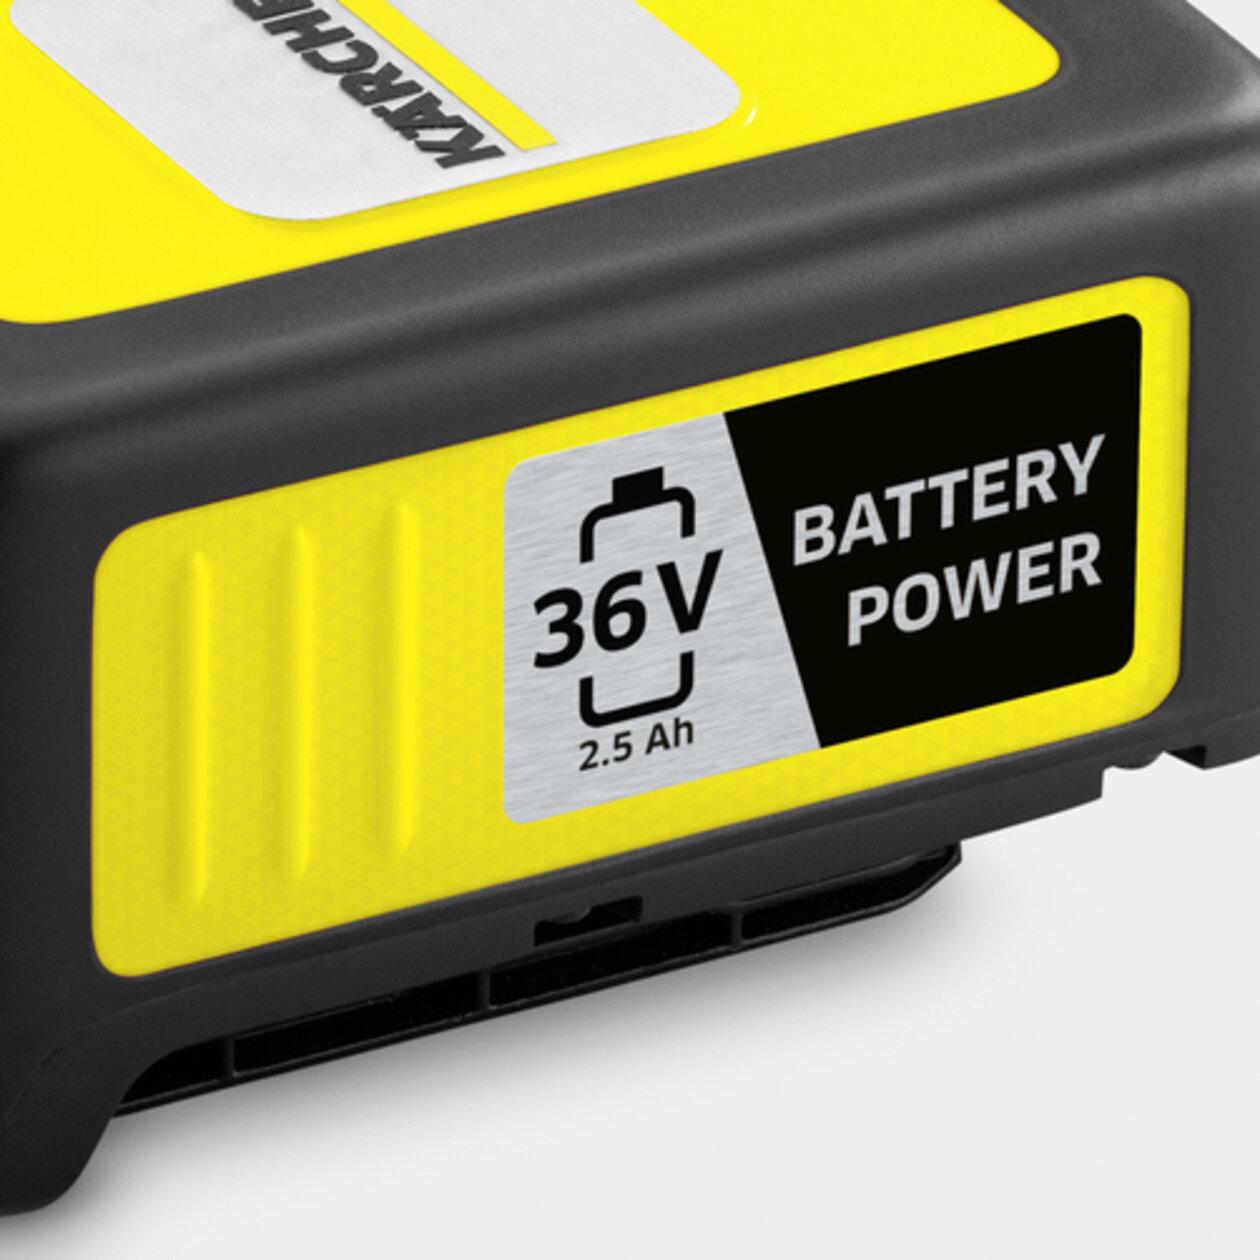 Baterie 36V / 2,5Ah: Bateriová platforma 36 V Bärcher Battery Power